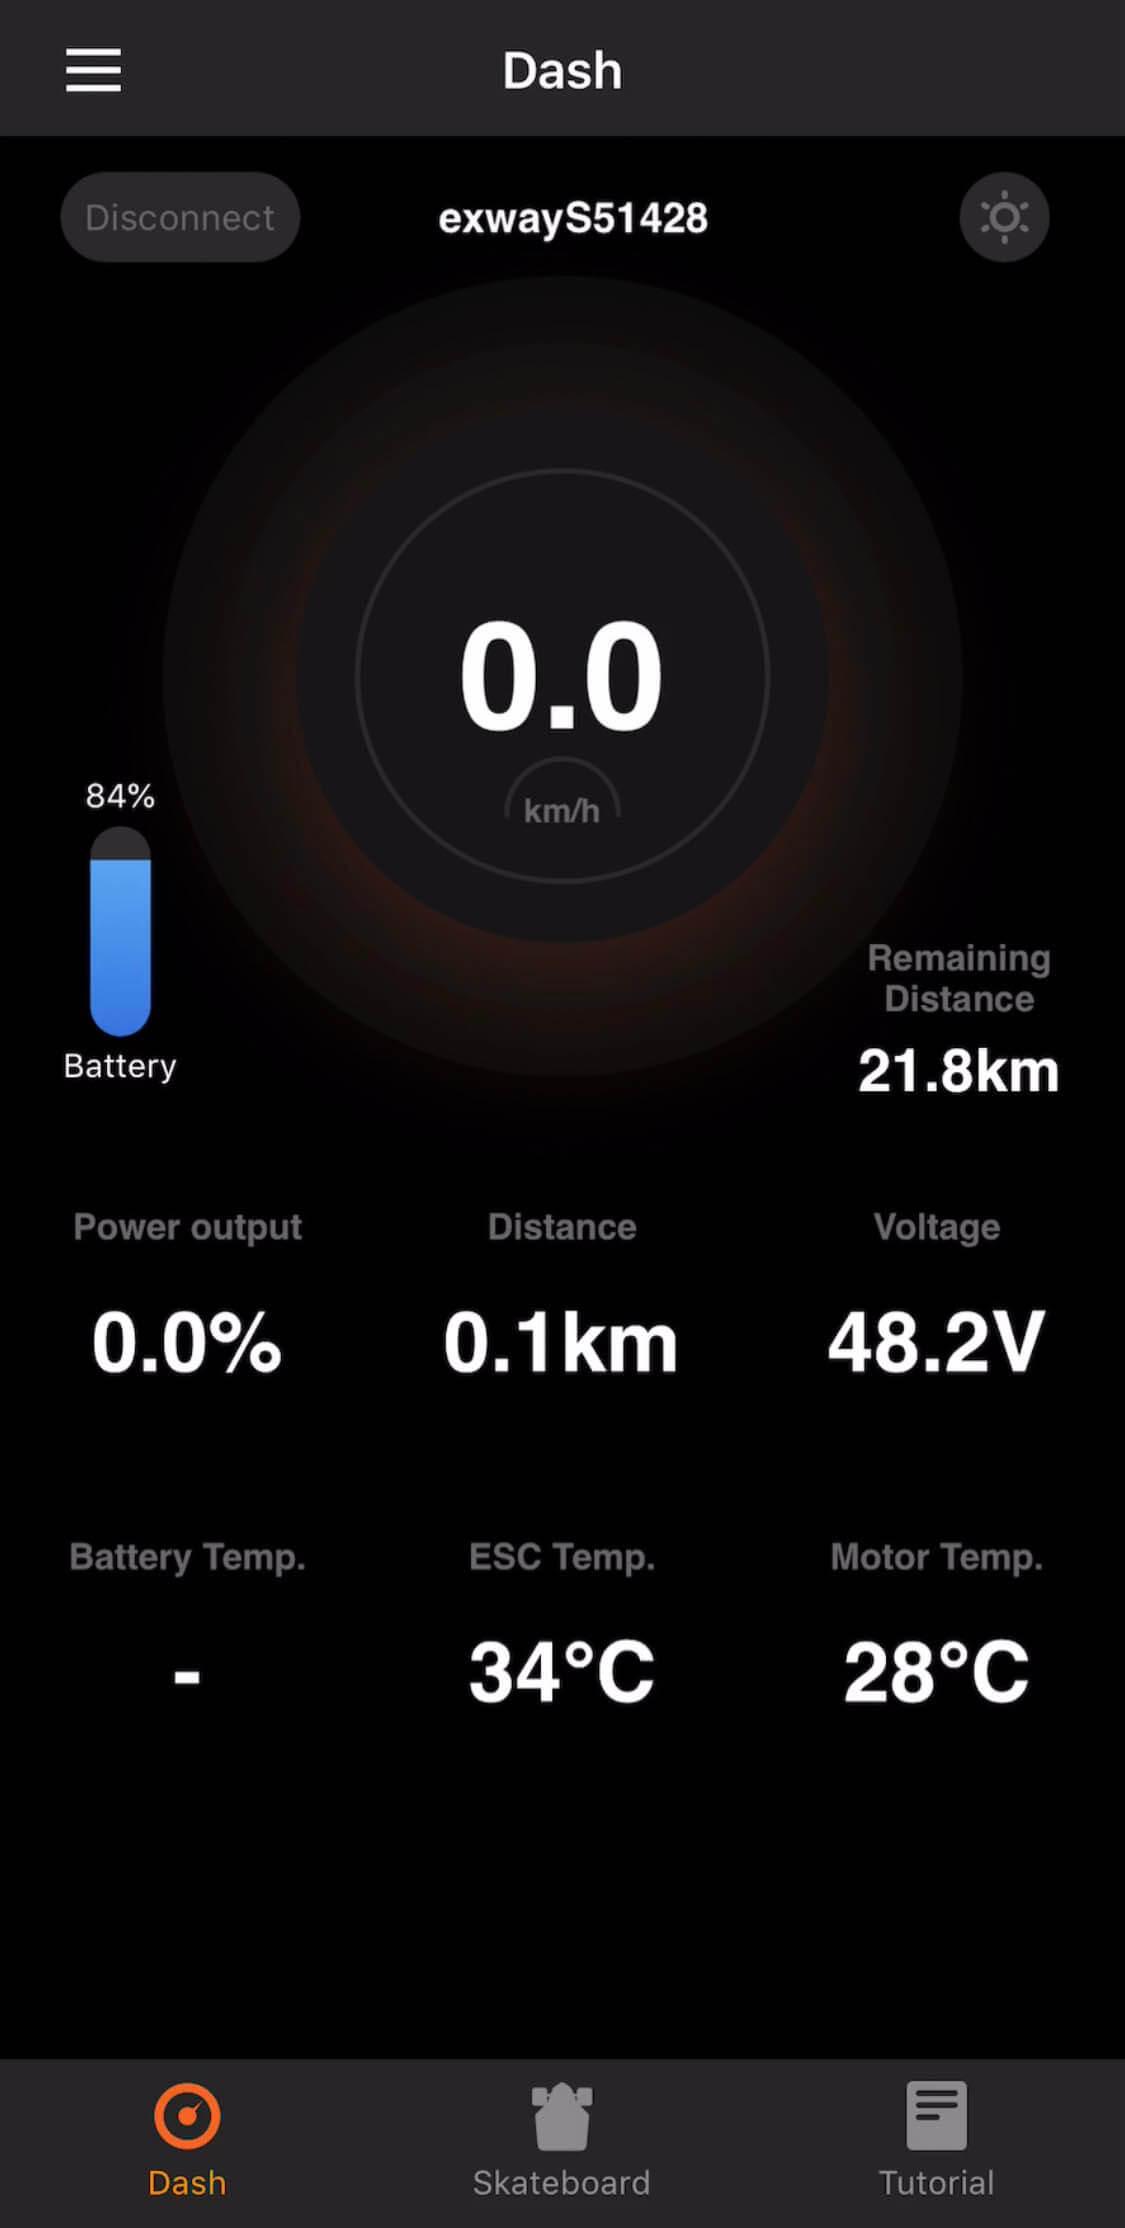 Exway Mobile App Dark mode Dash